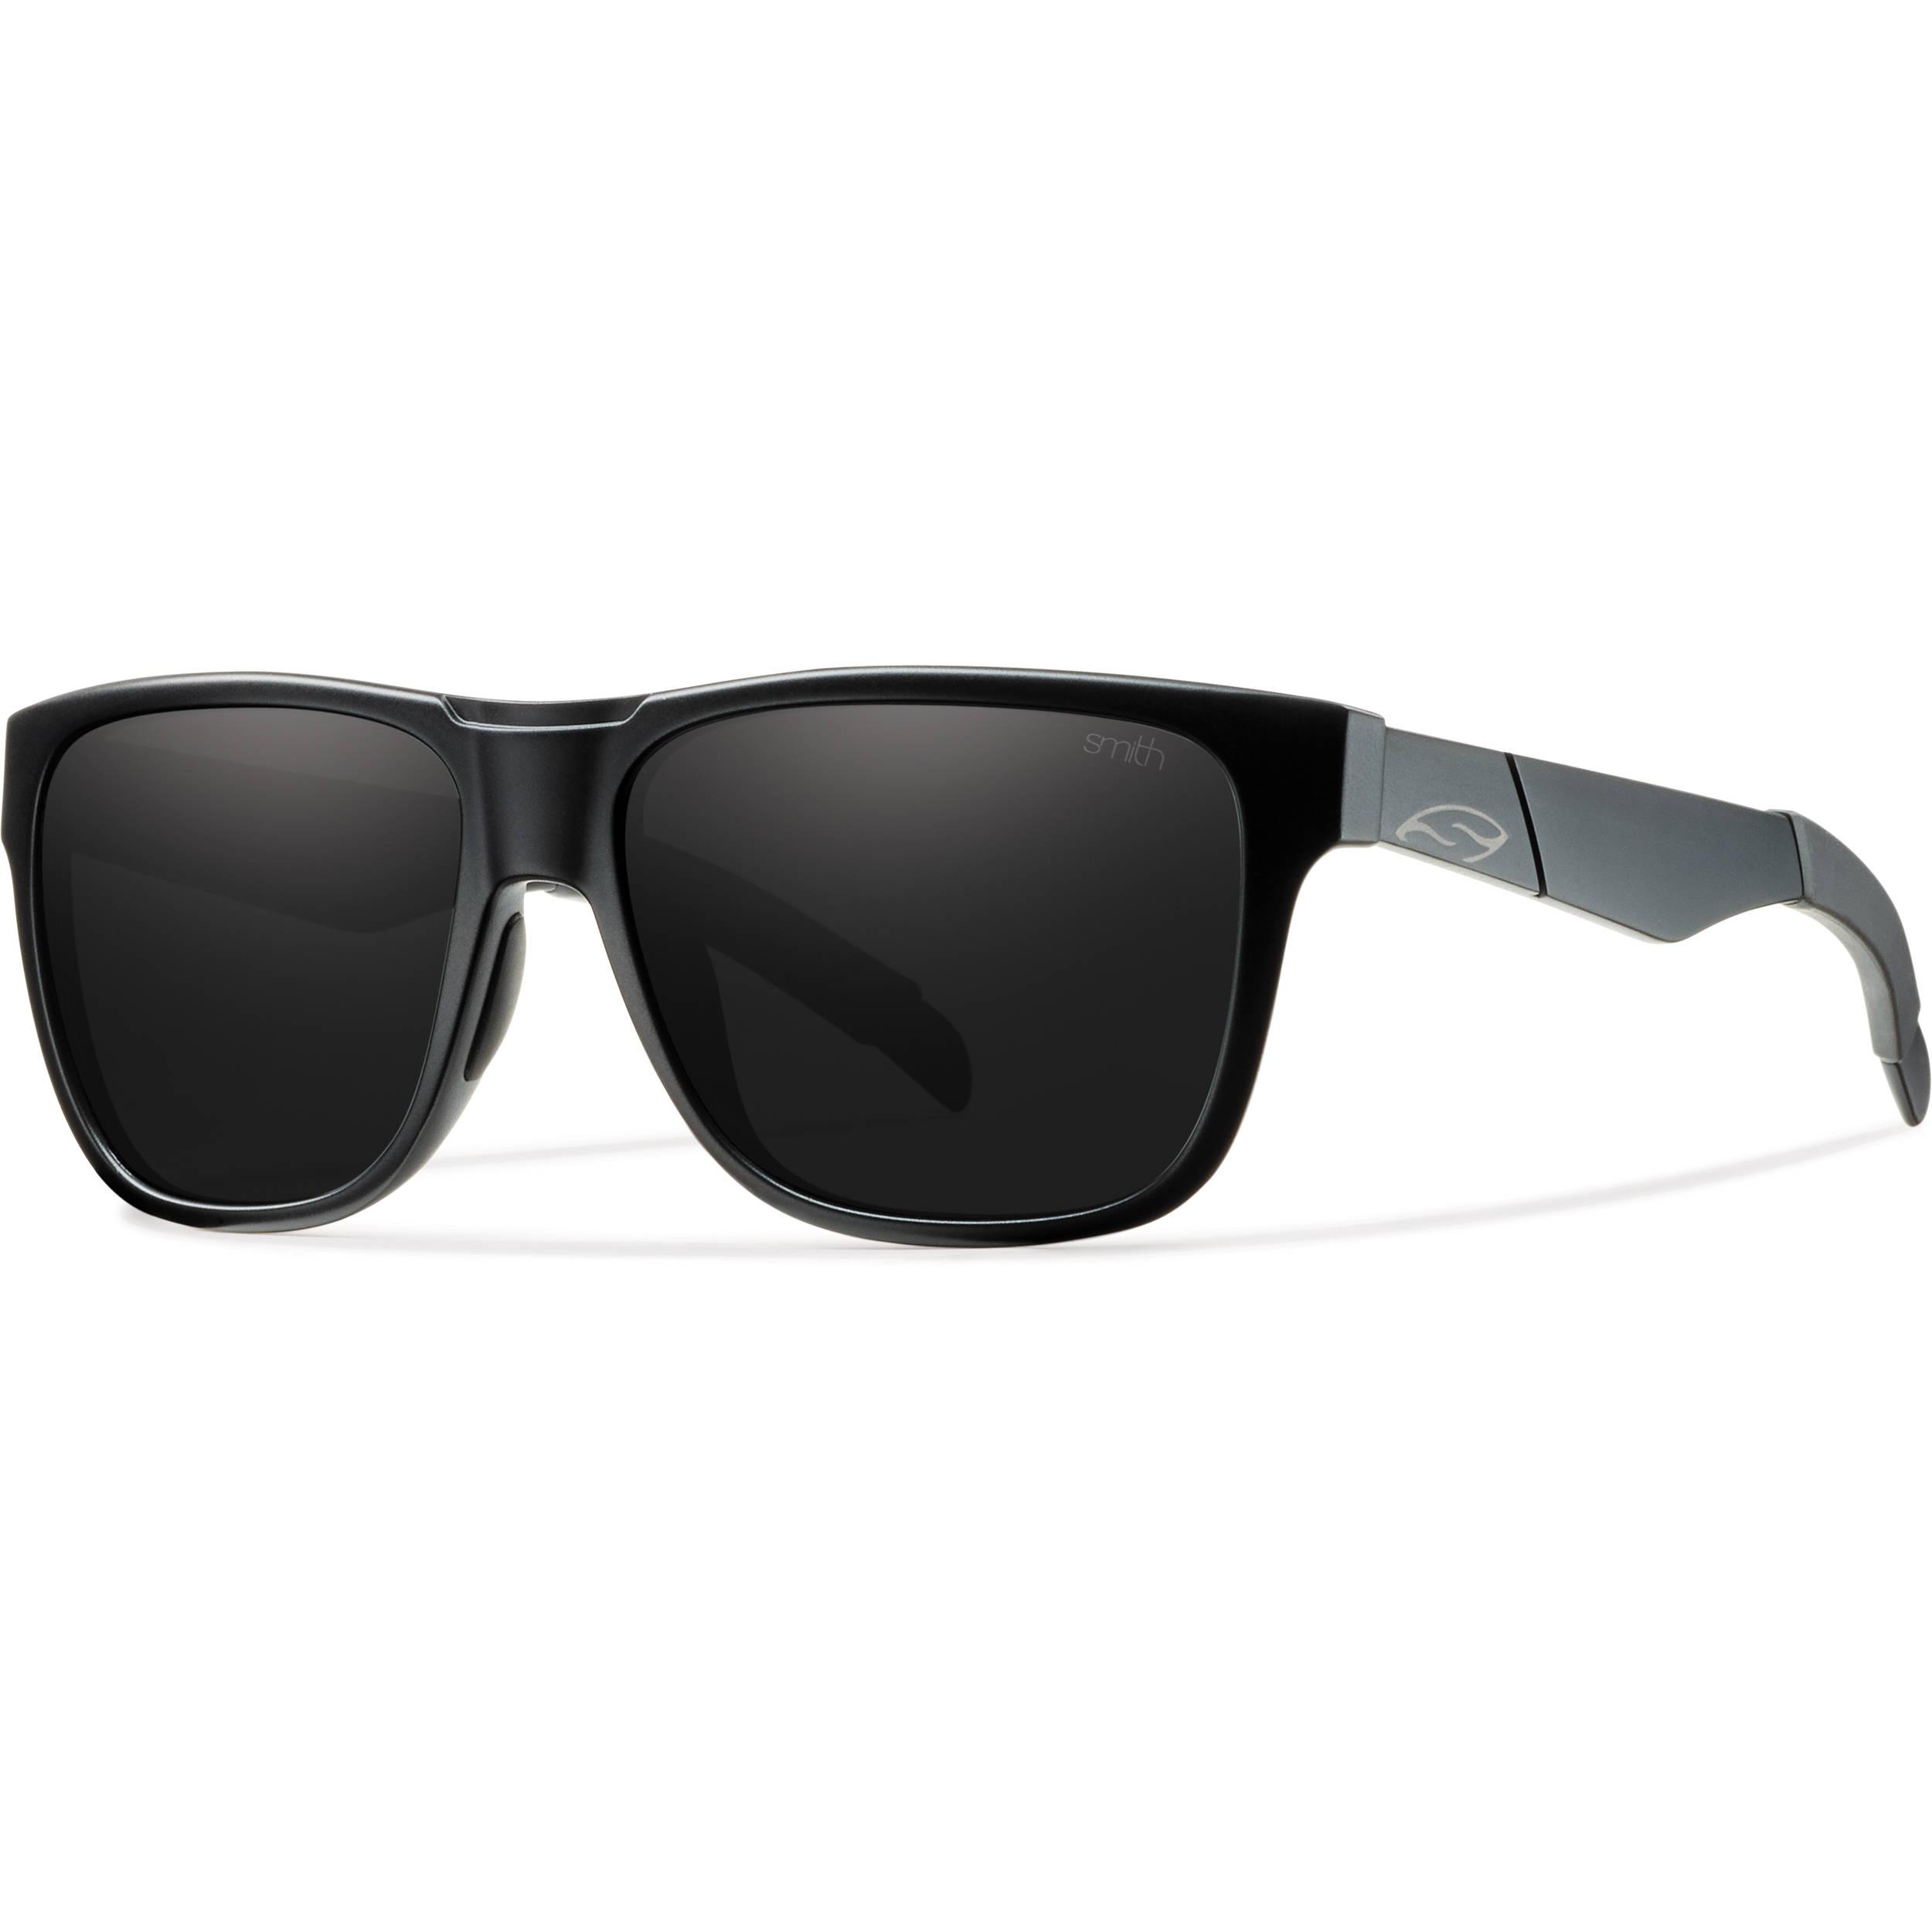 Smith Optics Lowdown Sunglasses LDPCBOIB B&H Photo Video